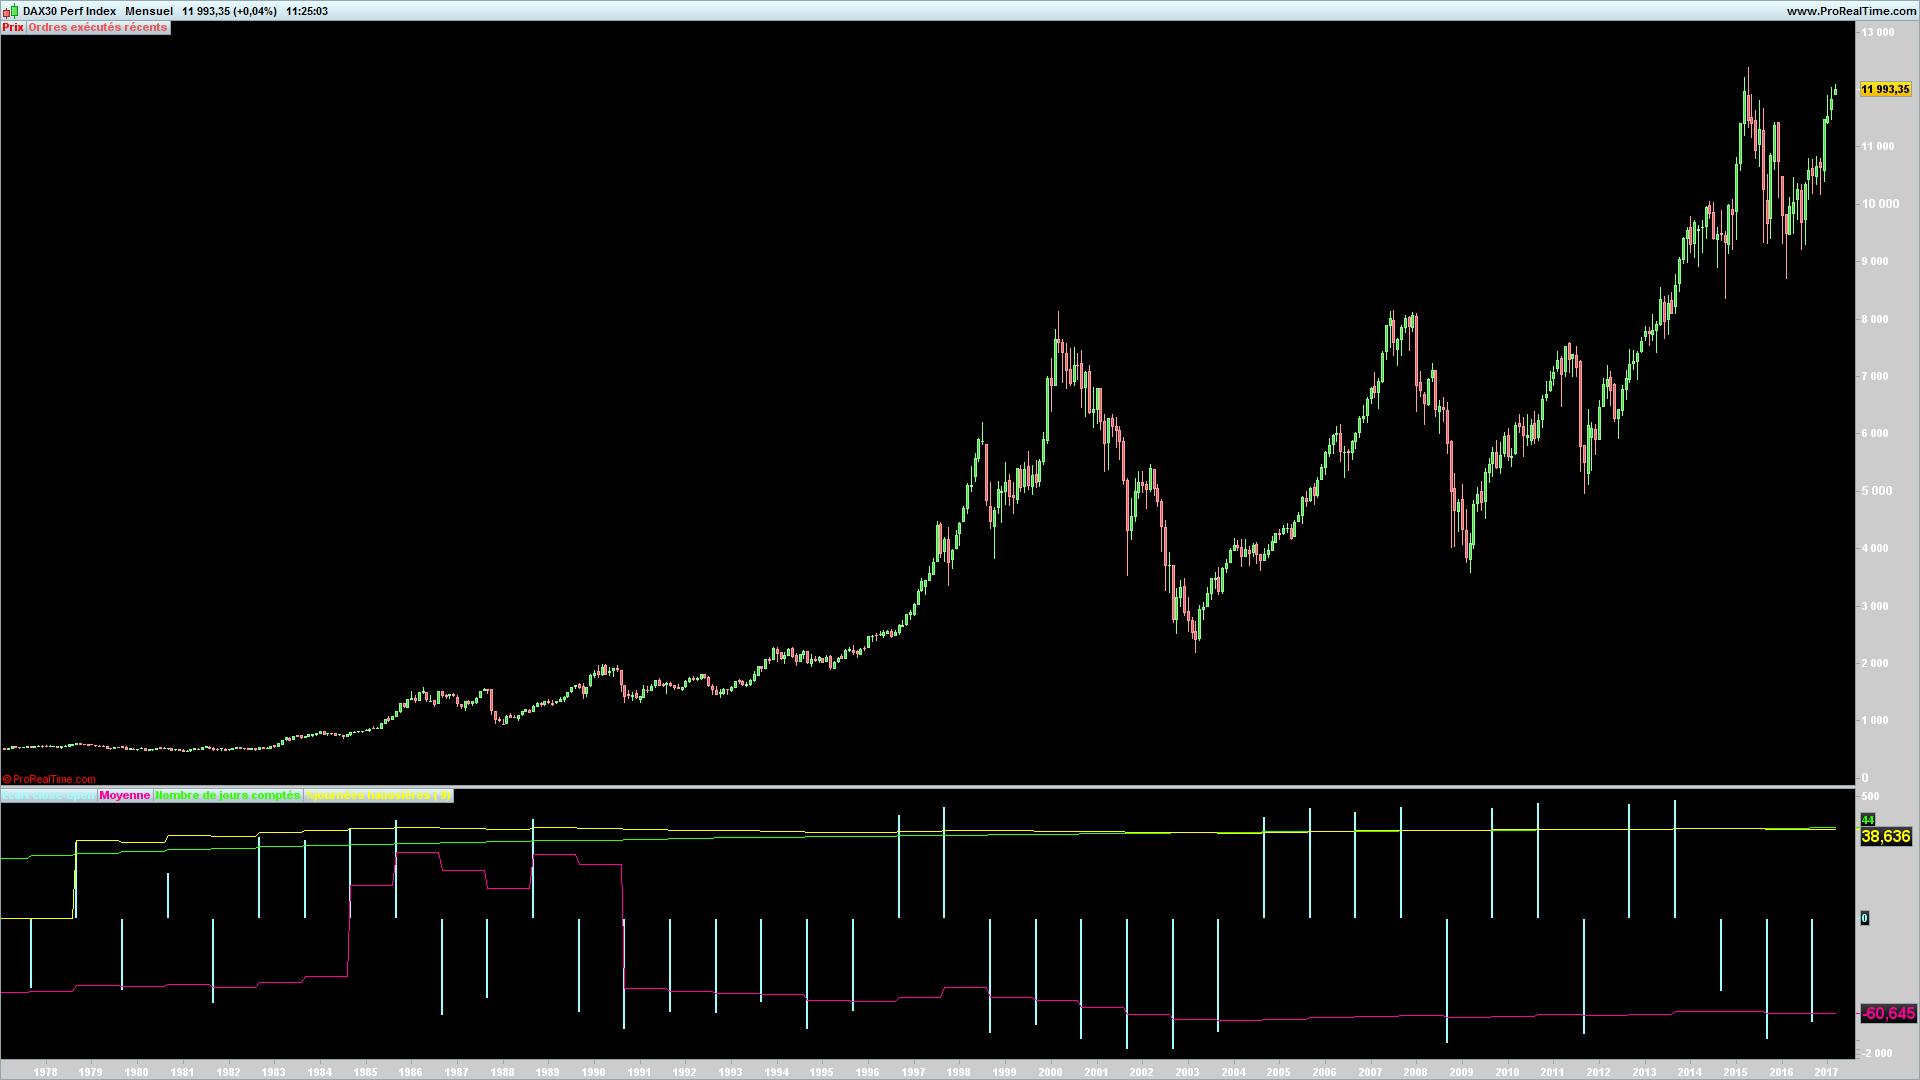 Dax trading system lang kurzfristig